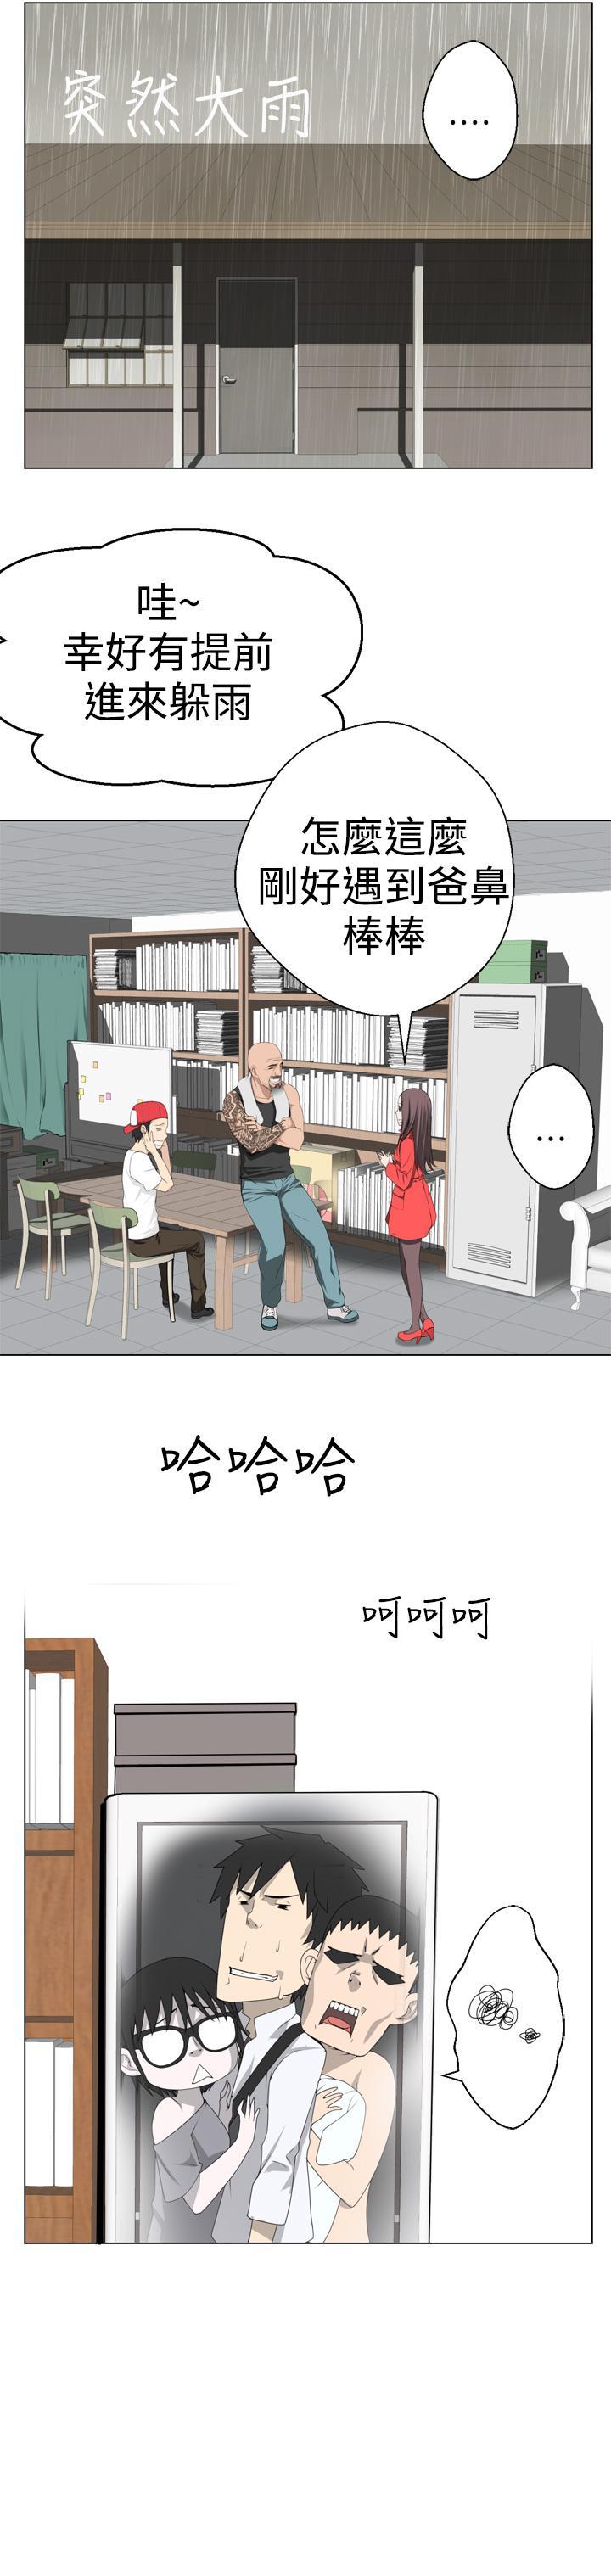 [SOSO] Franken Jo 为爱而生 法兰克赵 Ch.1~19 [Chinese]中文 170